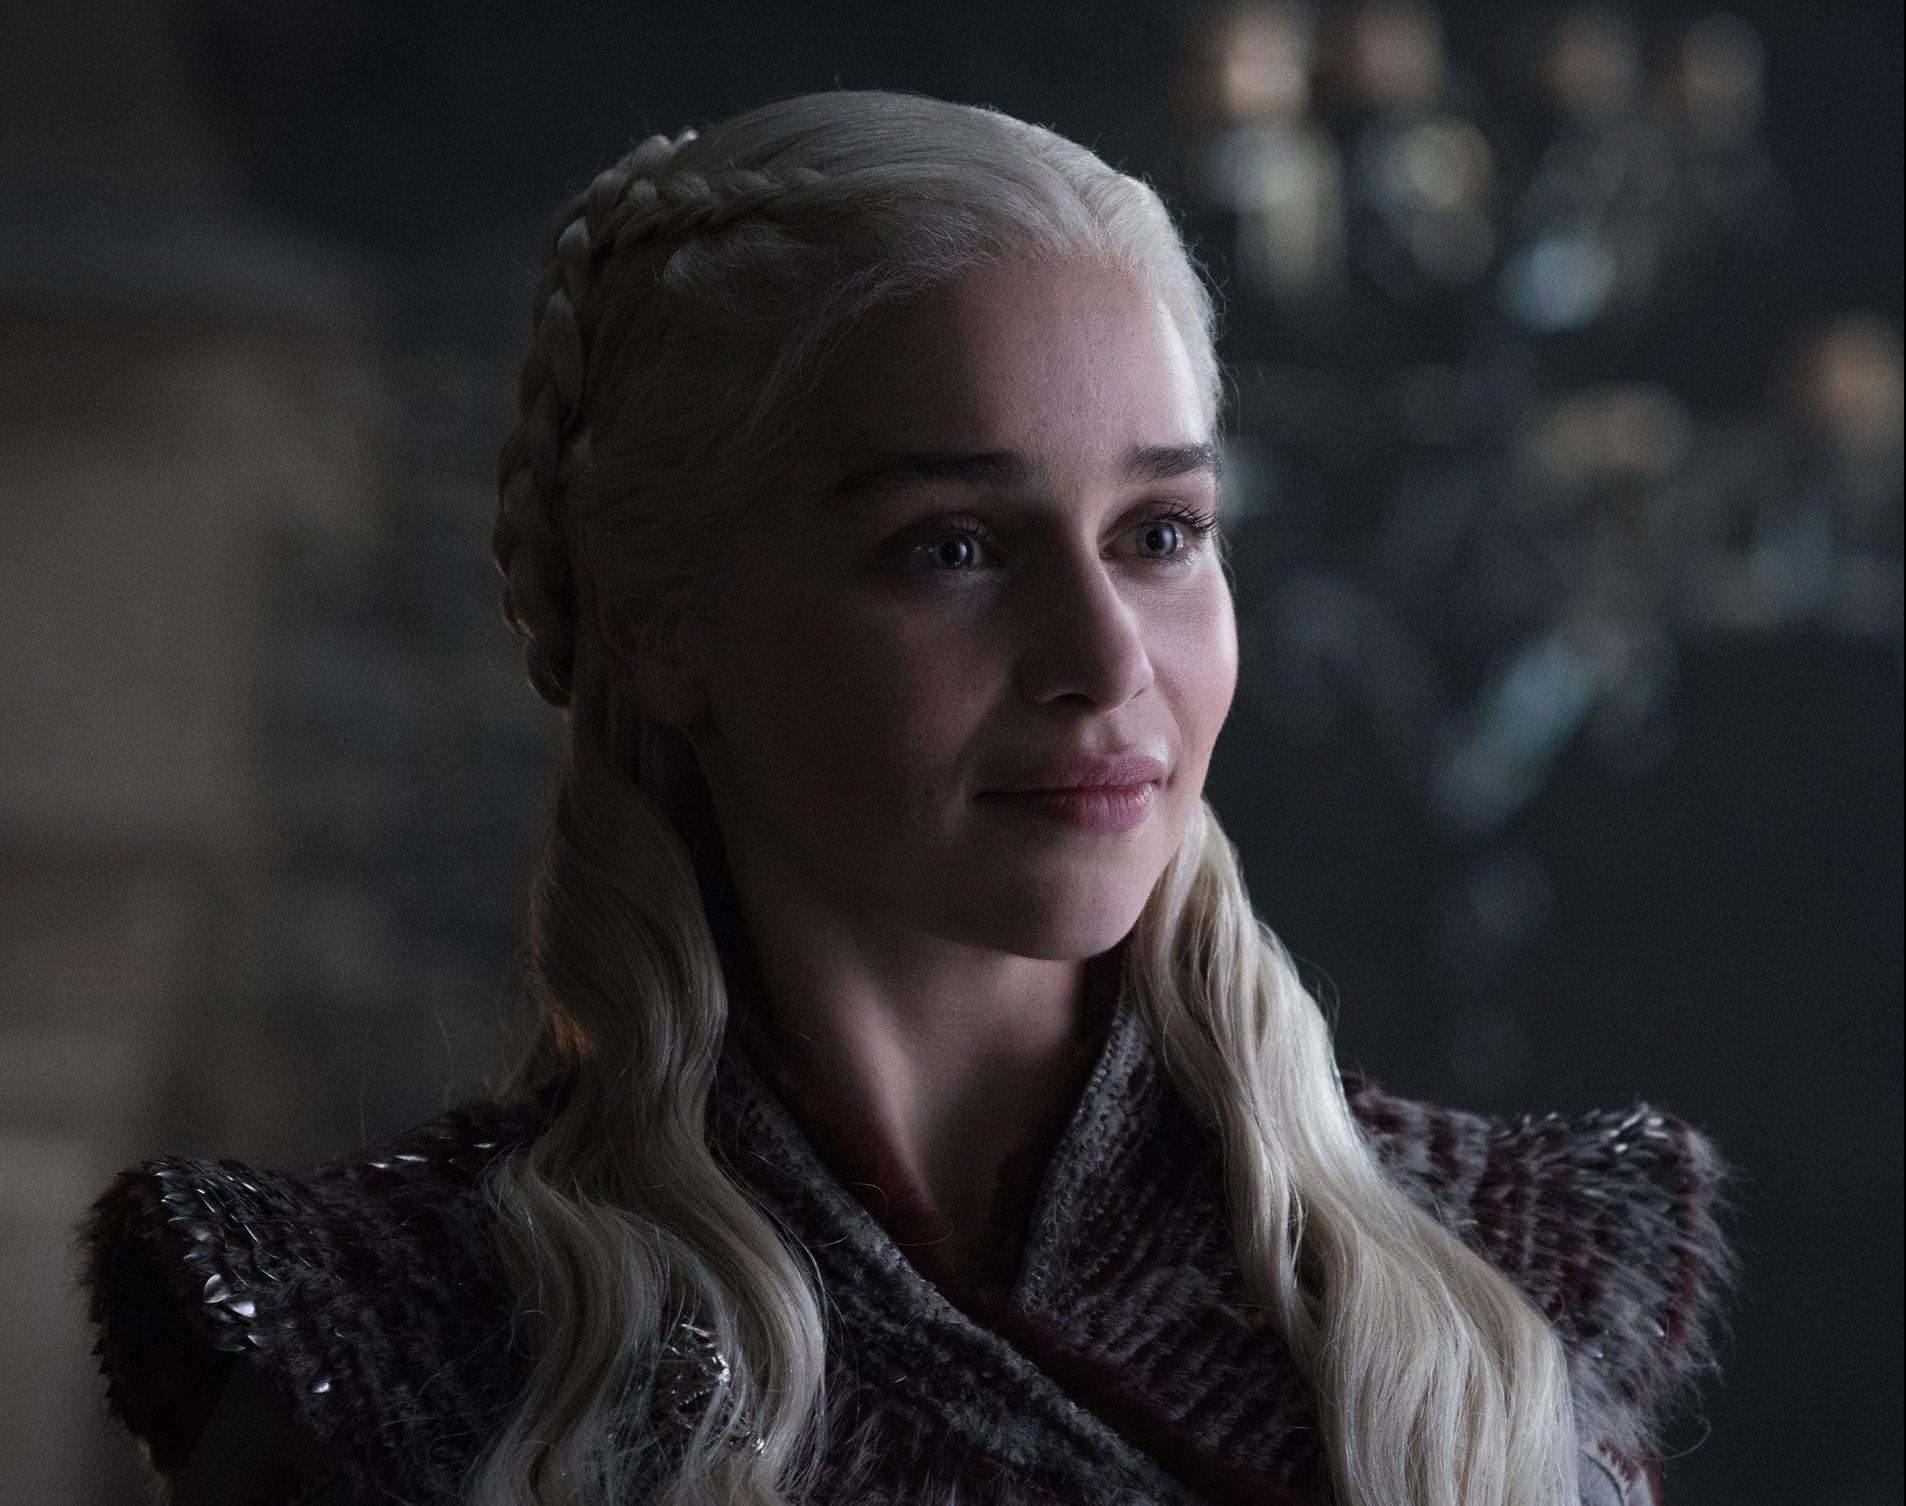 Game Of Thrones star Emilia Clarke defends 'logical' Daenerys storyline after season 8 finale